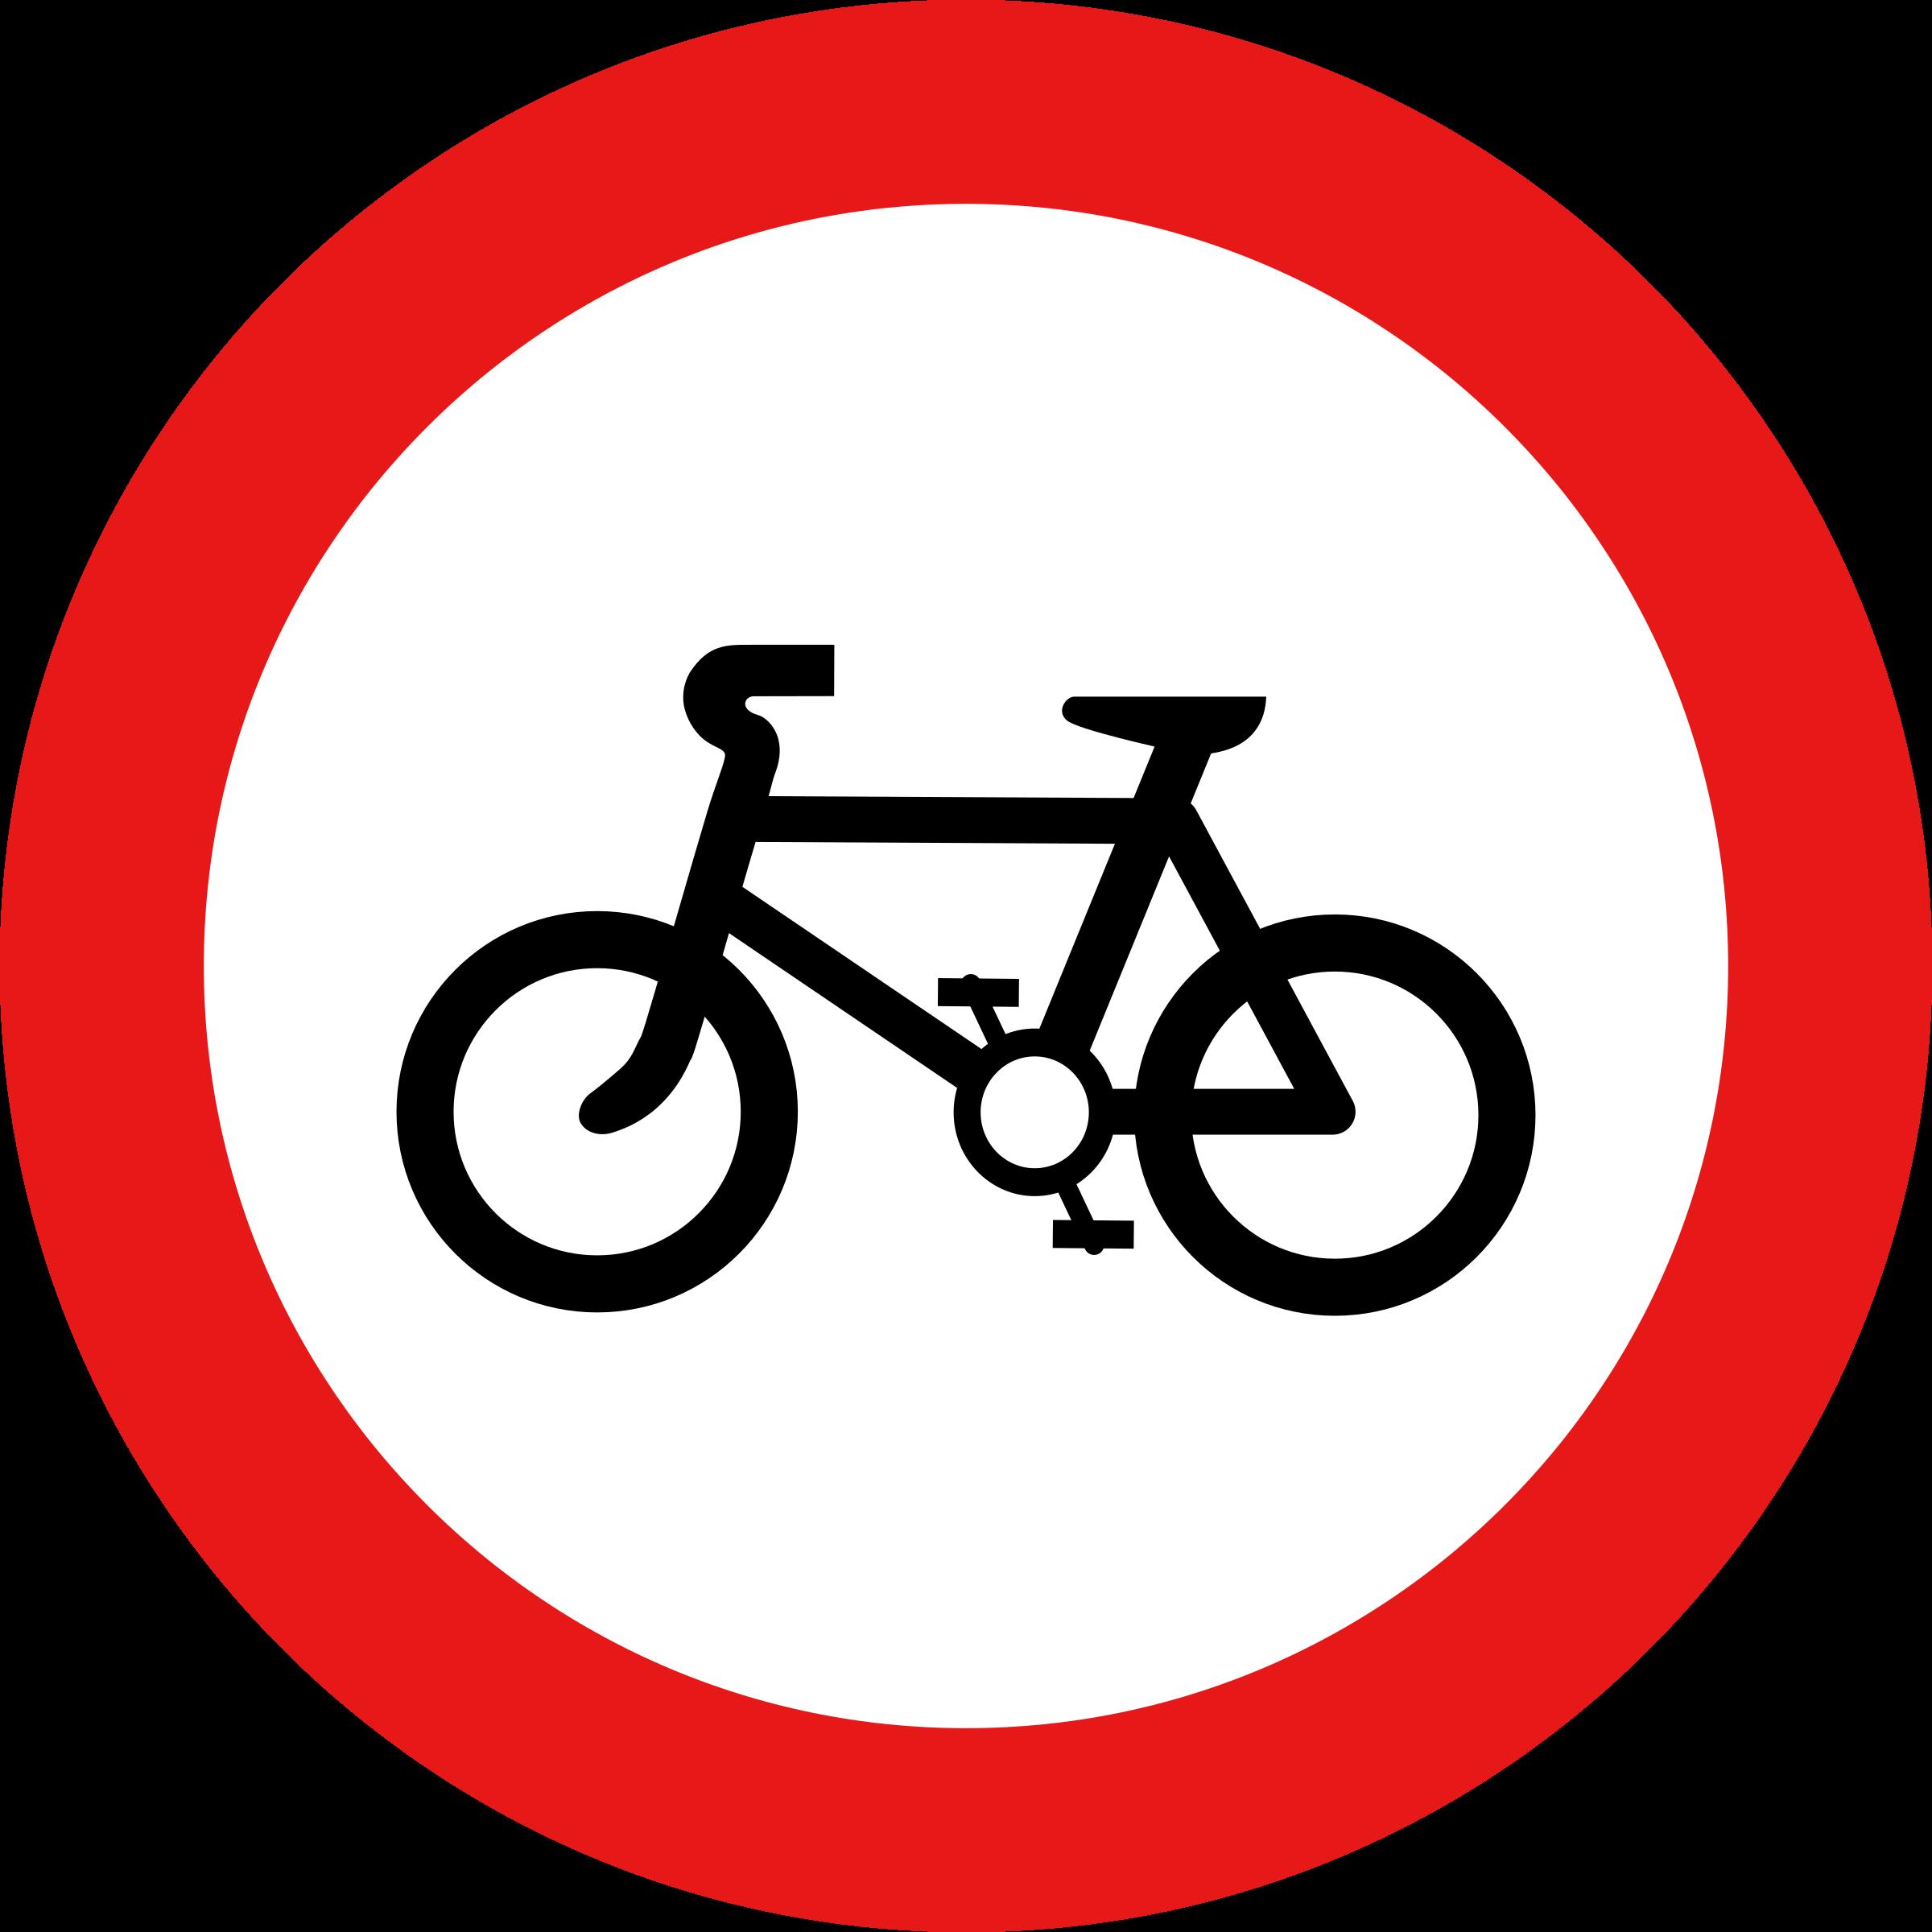 Transportation cycle